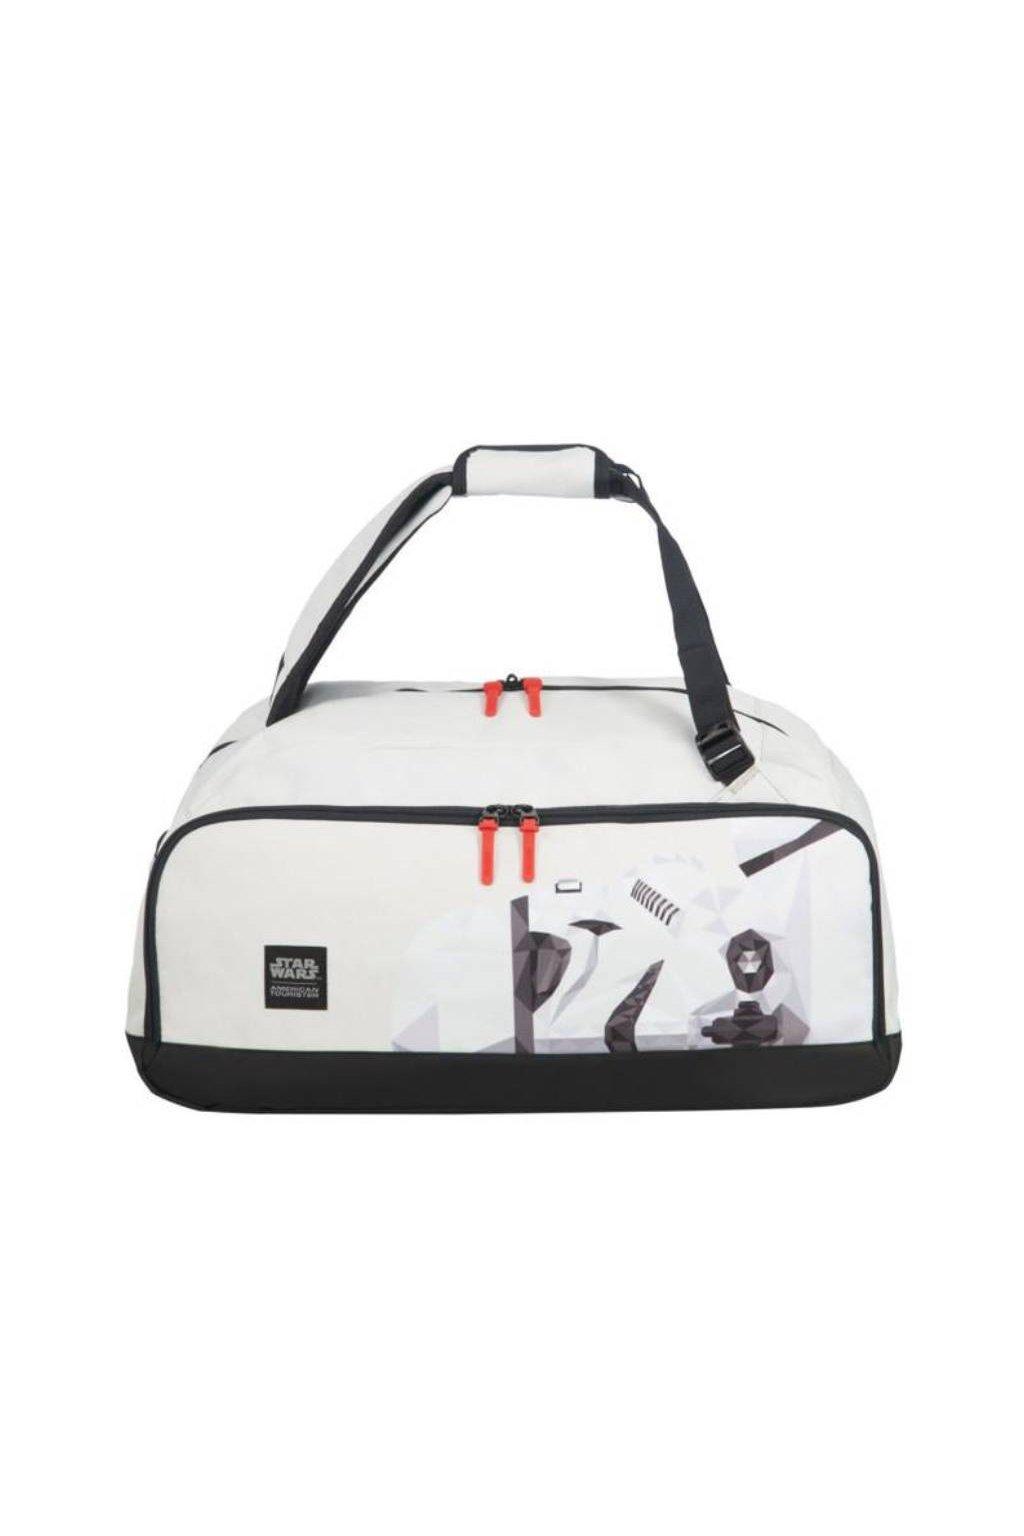 kufrland americantourister grabngo backpackandduffle disney starwars stormtrooper (4)